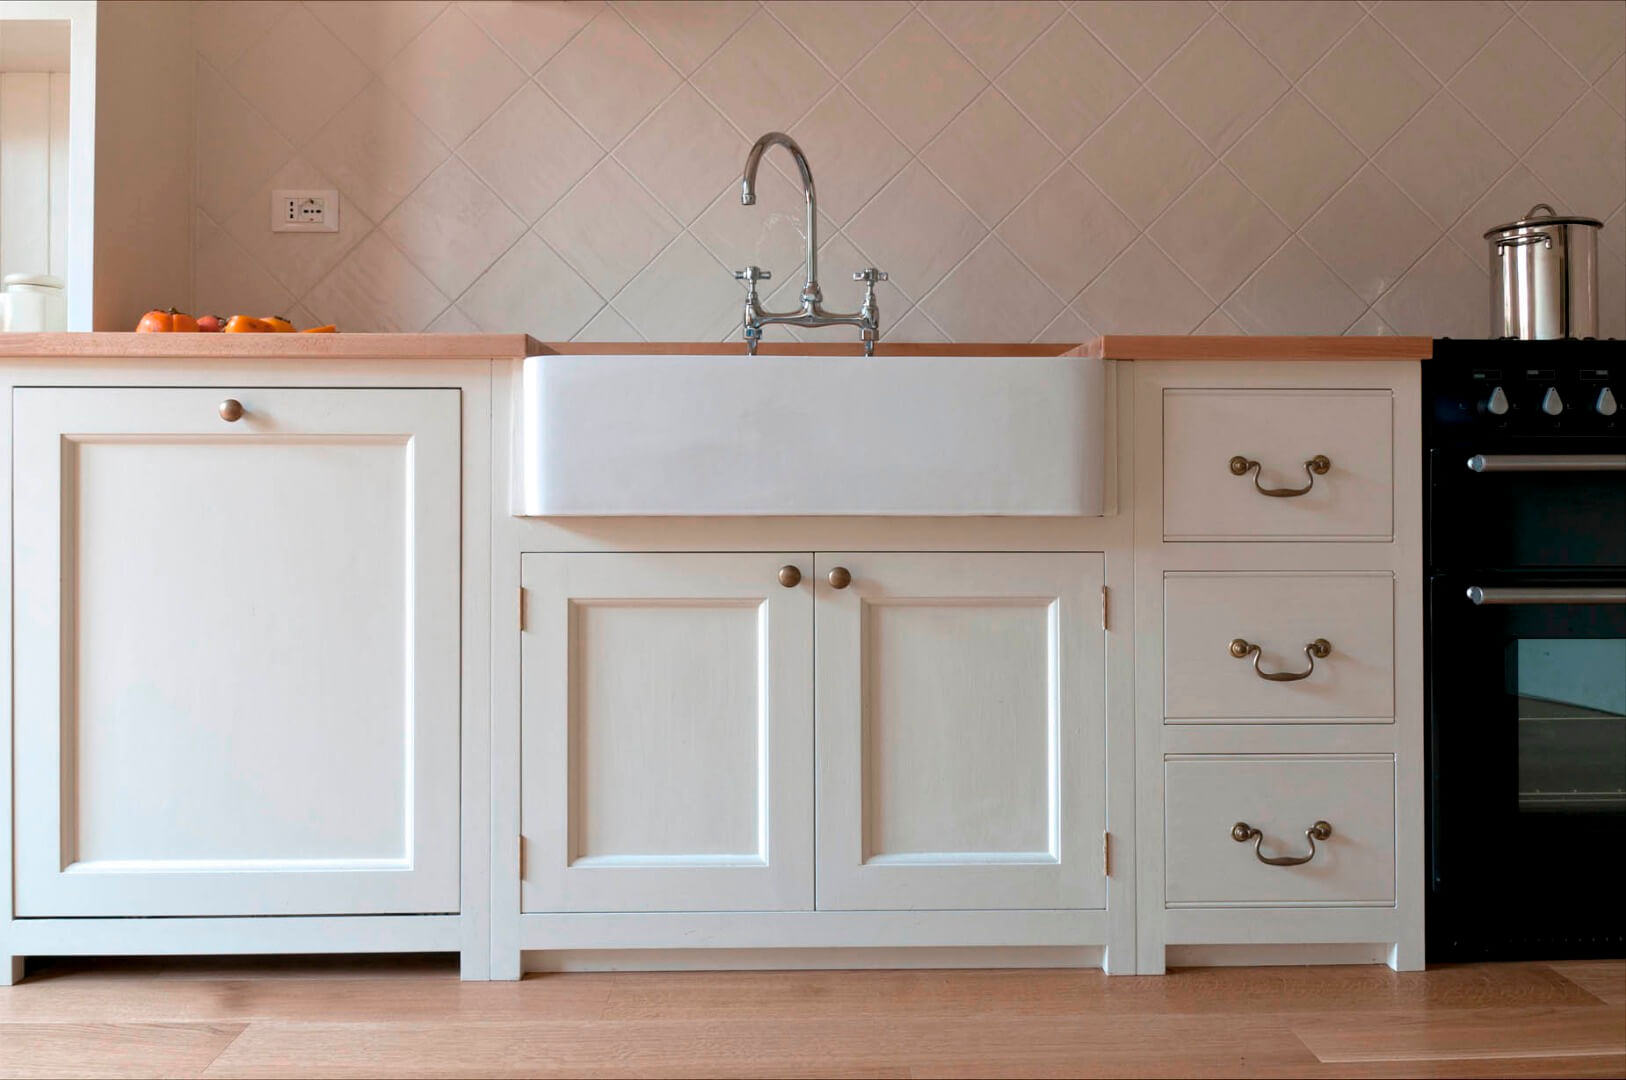 Stunning Lavandino Cucina In Ceramica Pictures - Skilifts.us ...